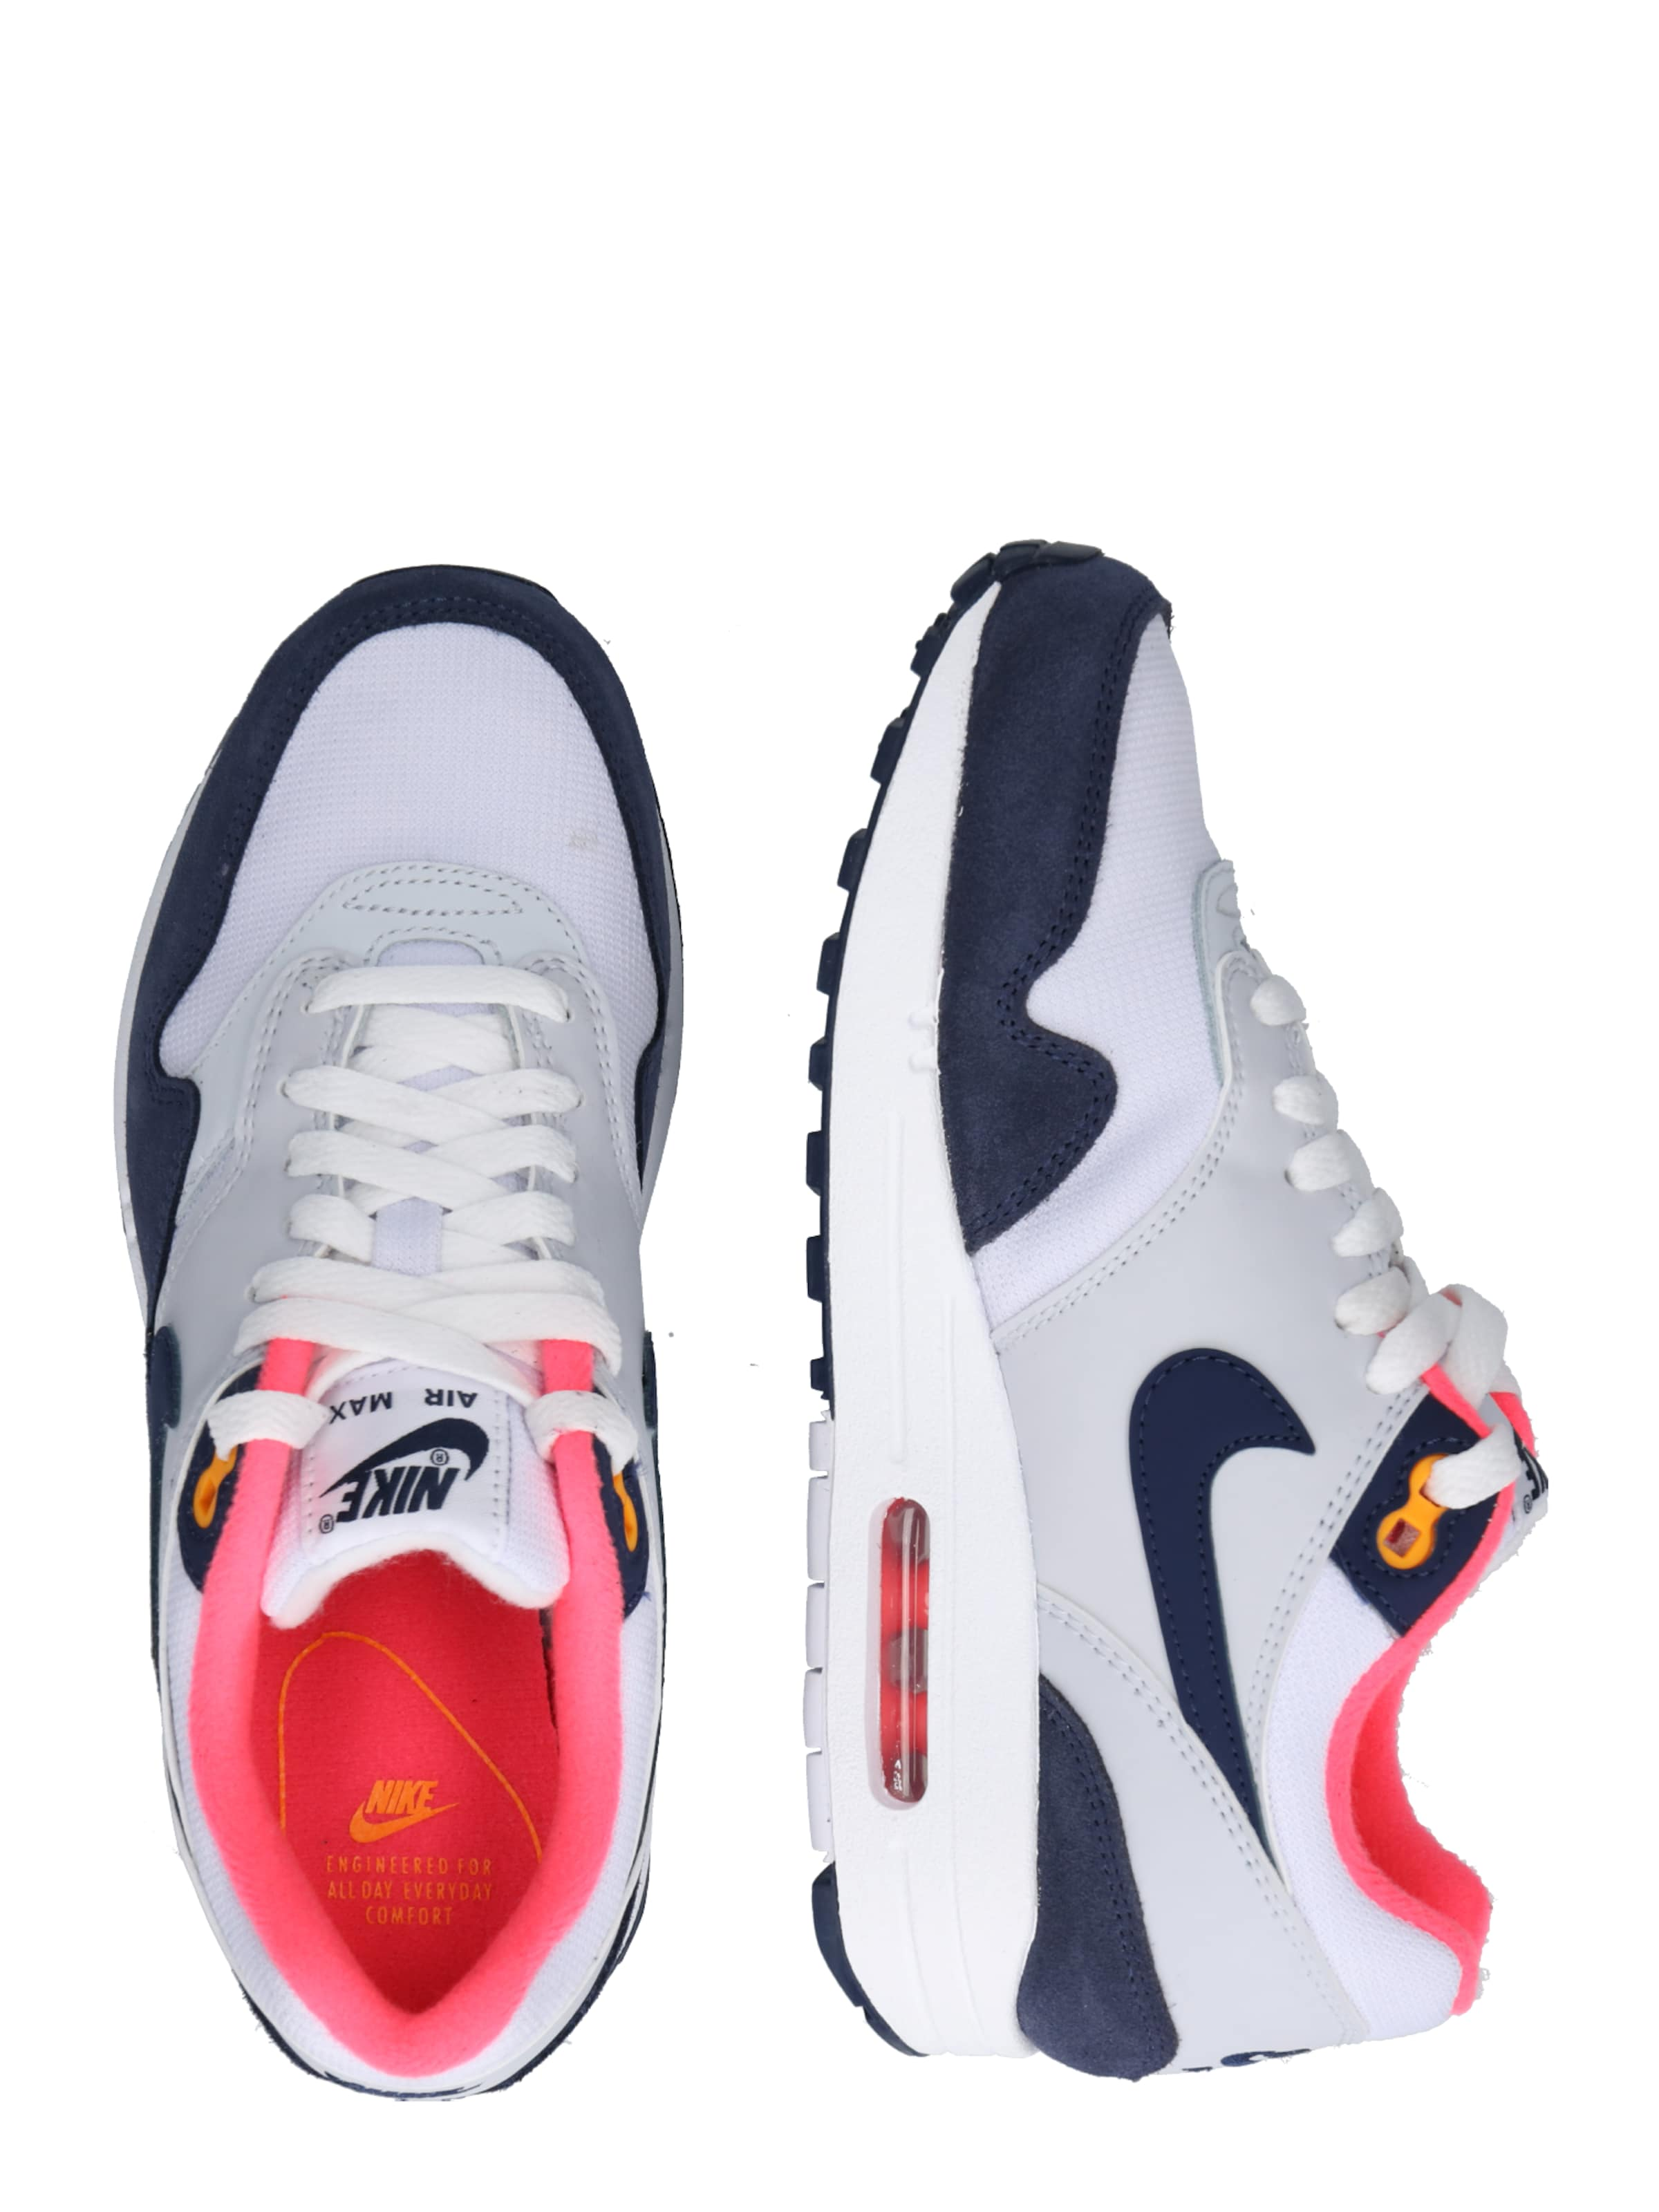 Weiß 1' Sportswear 'air Max In Nike Sneaker NavyHellgrau Pink 35AR4jL